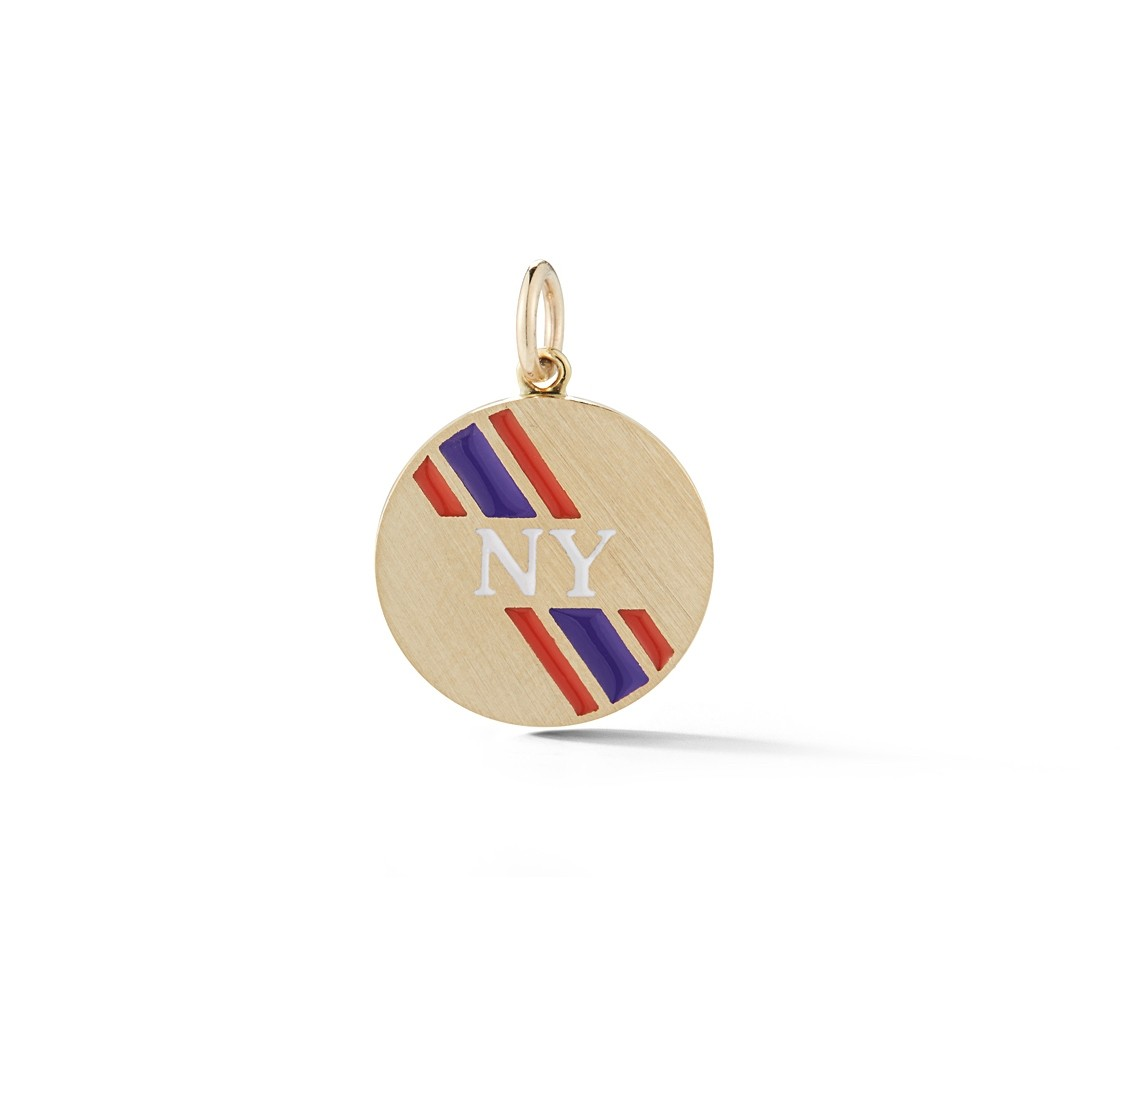 Petite Round Personalized Enamel Stripe Charm